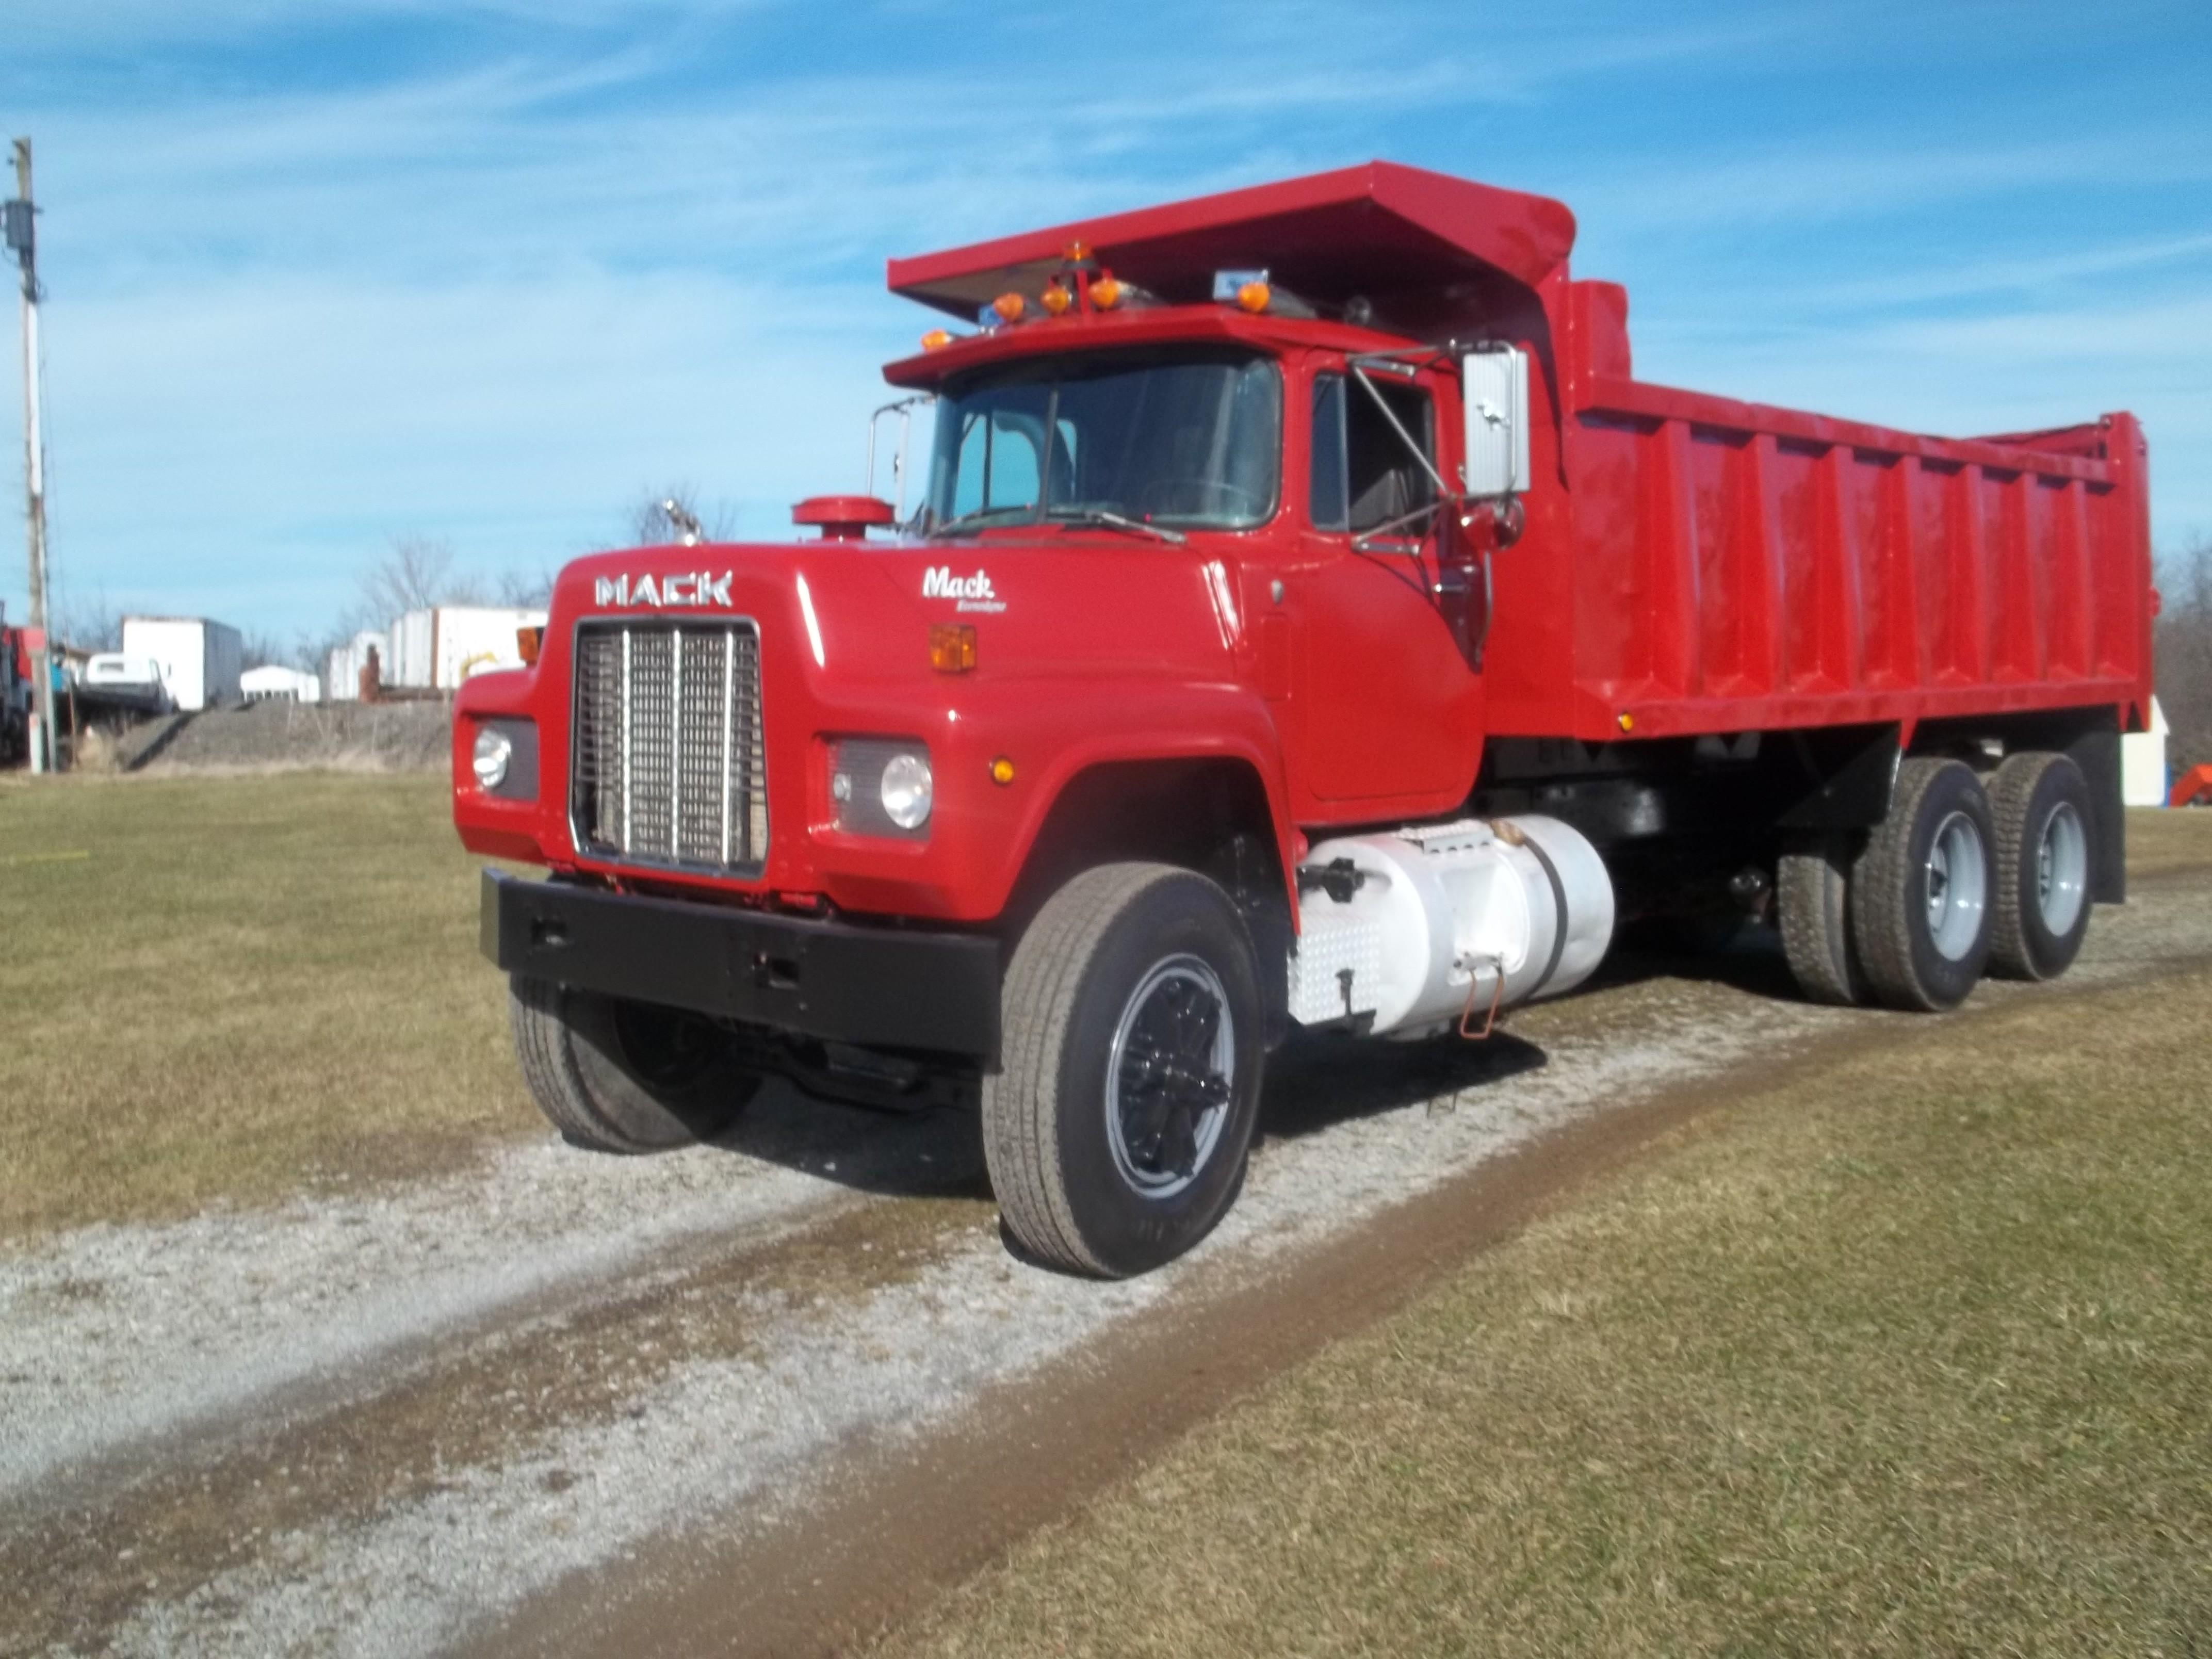 Used, 1989, Mack, RD 688, Dump Trucks